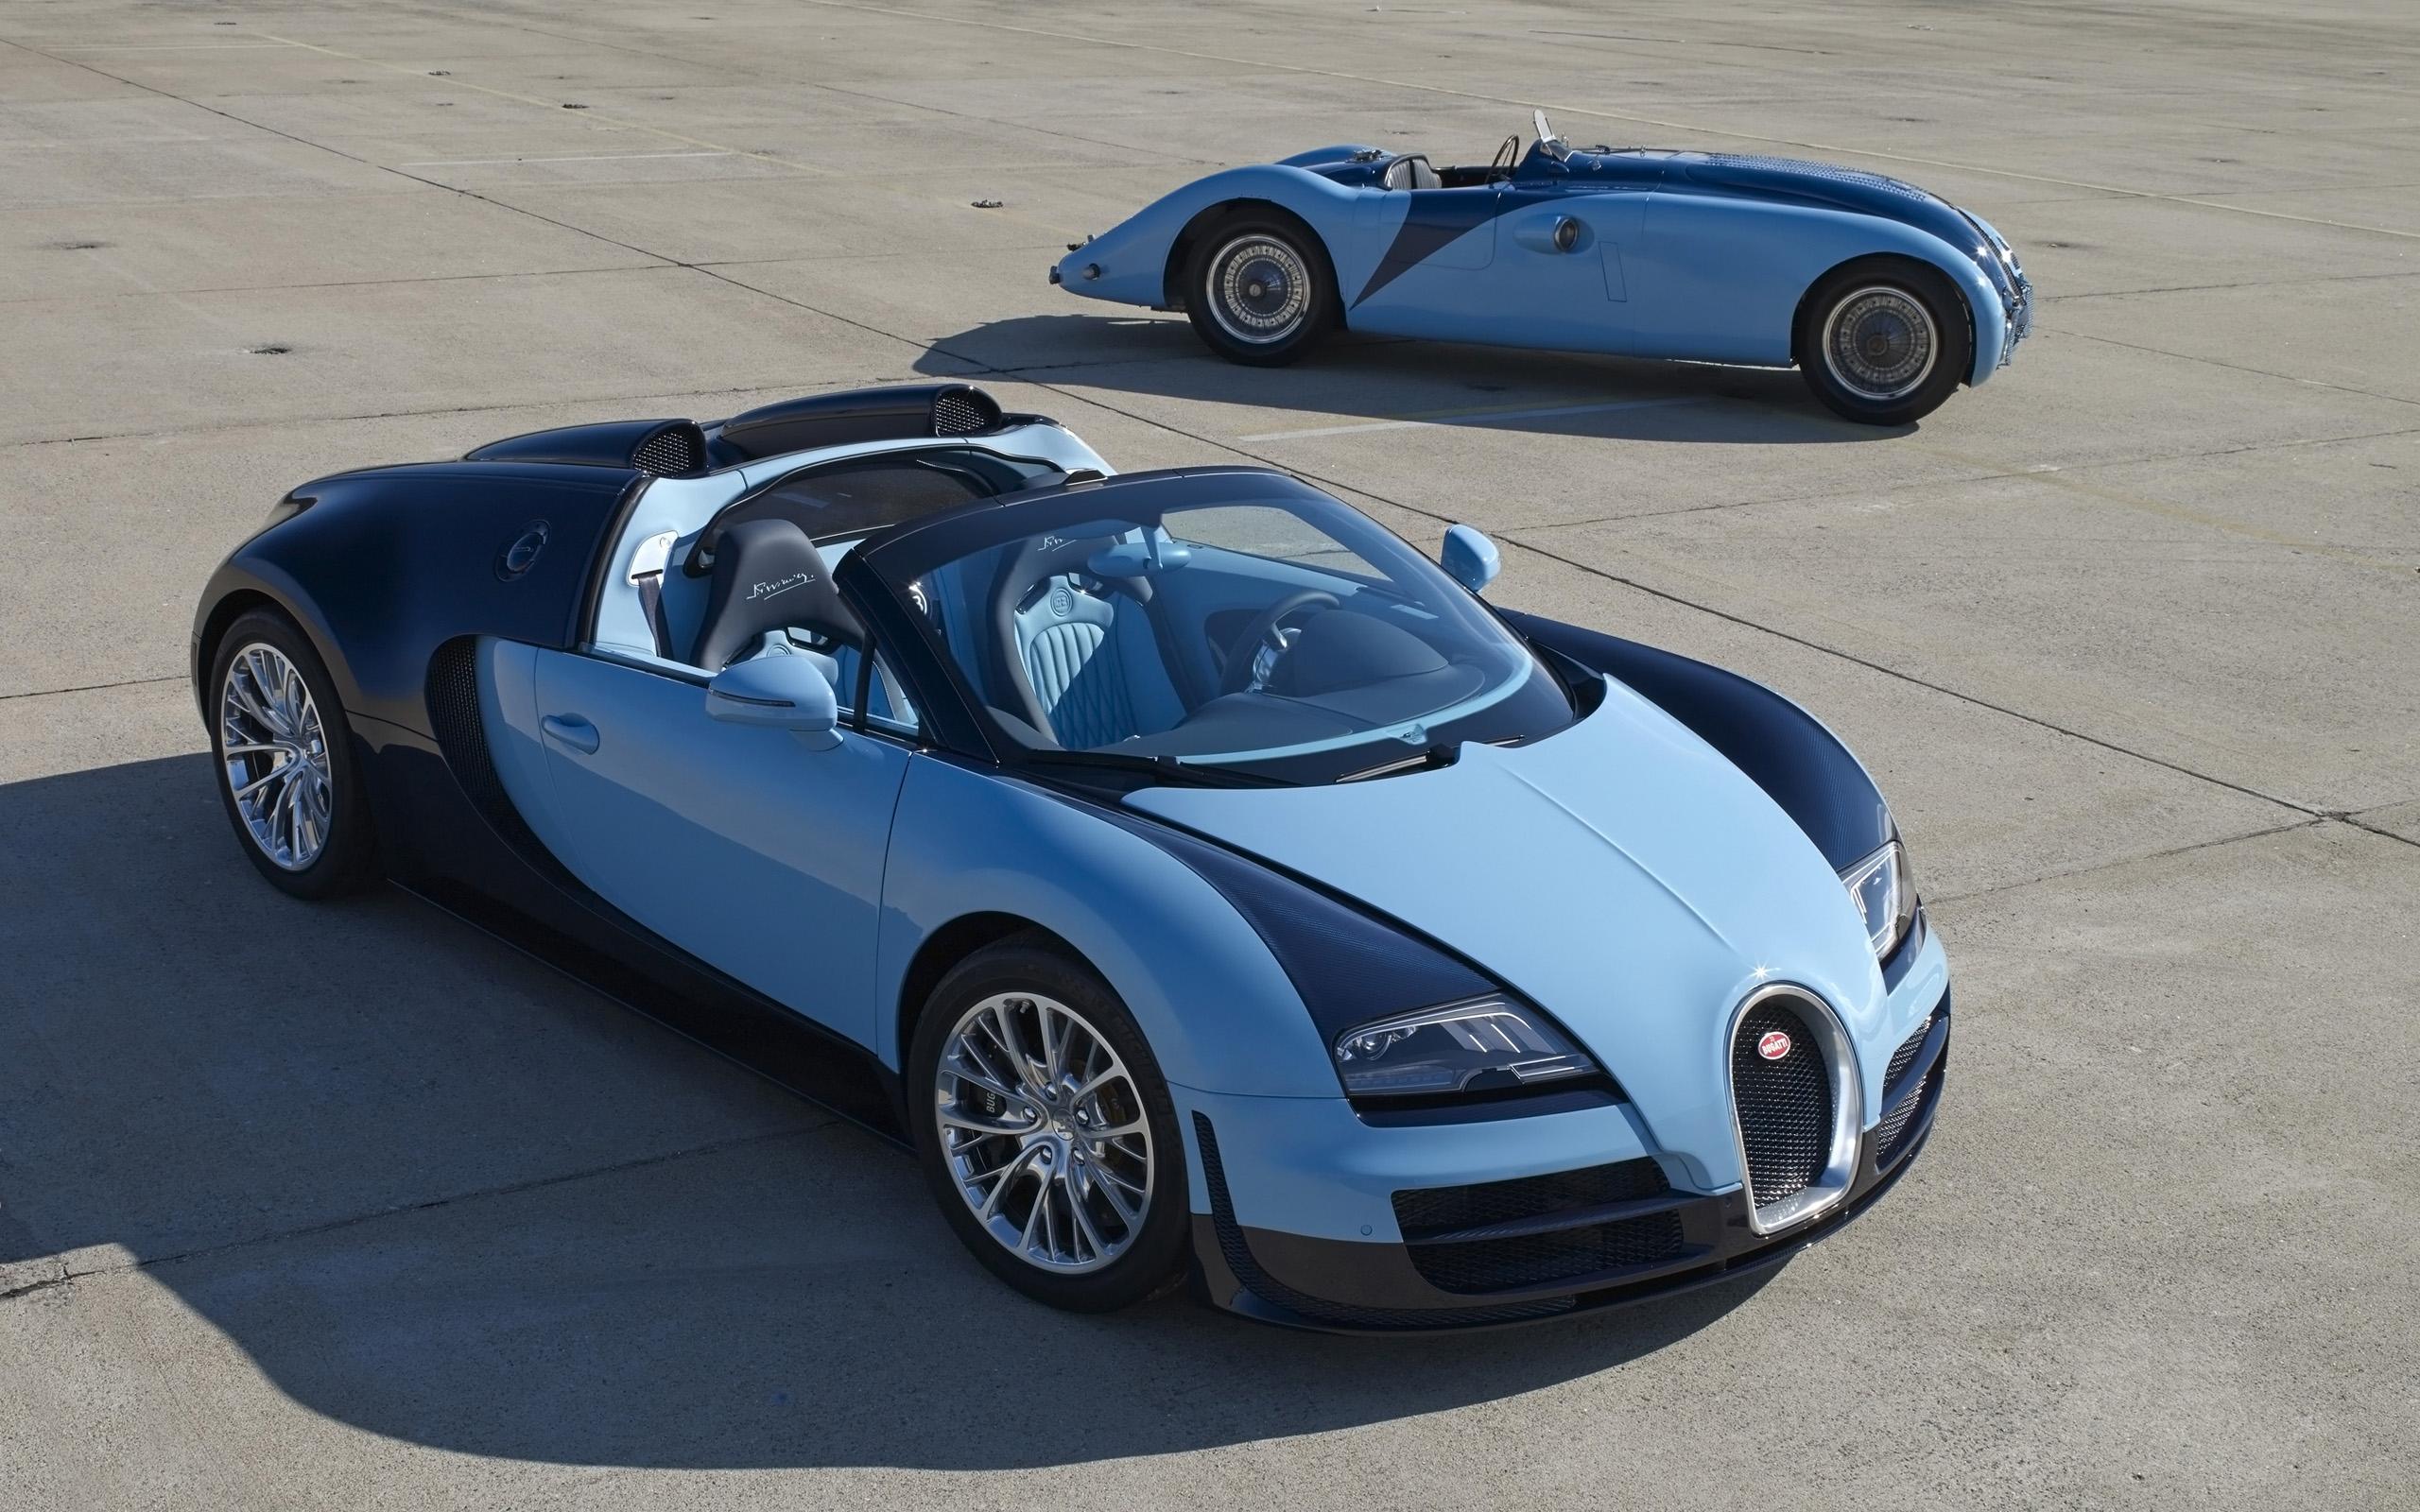 bugatti-veyron-grand-sport-vitesse-legend-jean-pierre-wimille-Bugatti-Veyro-wallpaper-wp3403551